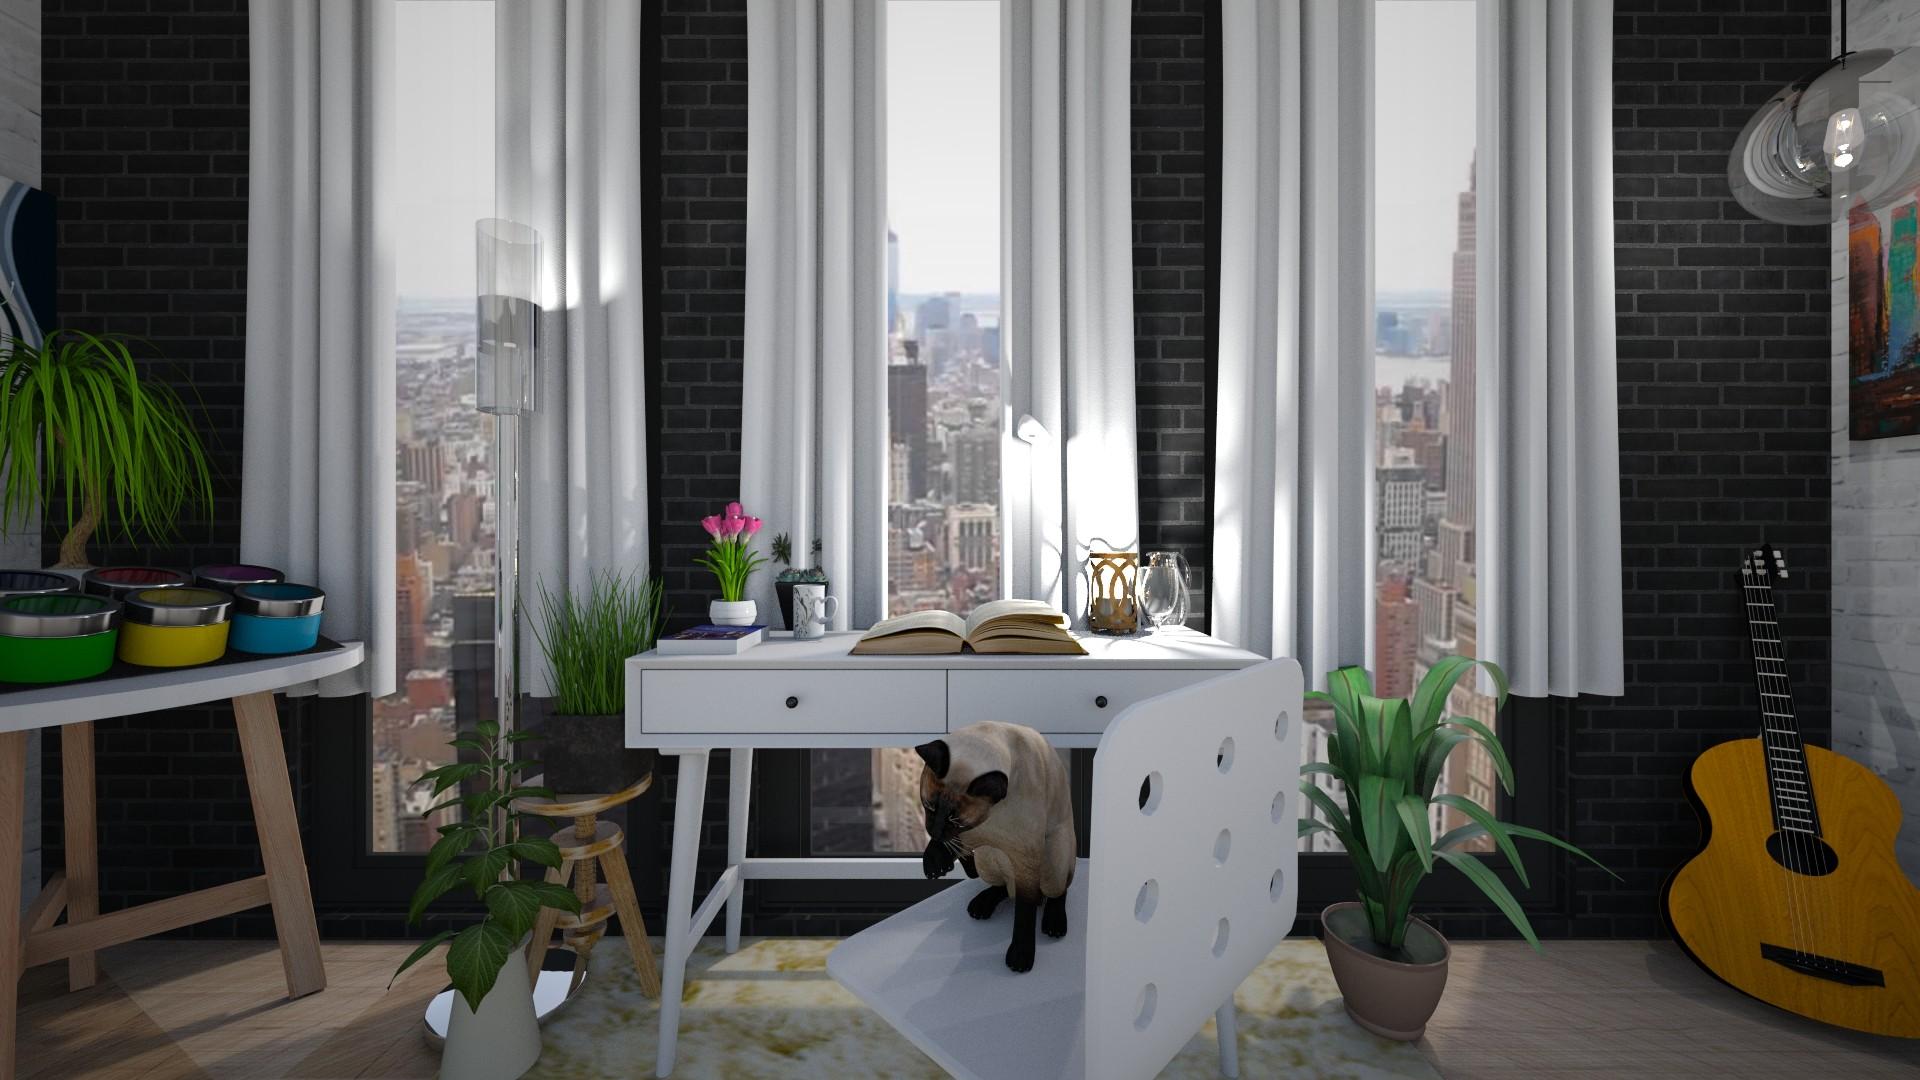 Home Office - by Sugarfishfish